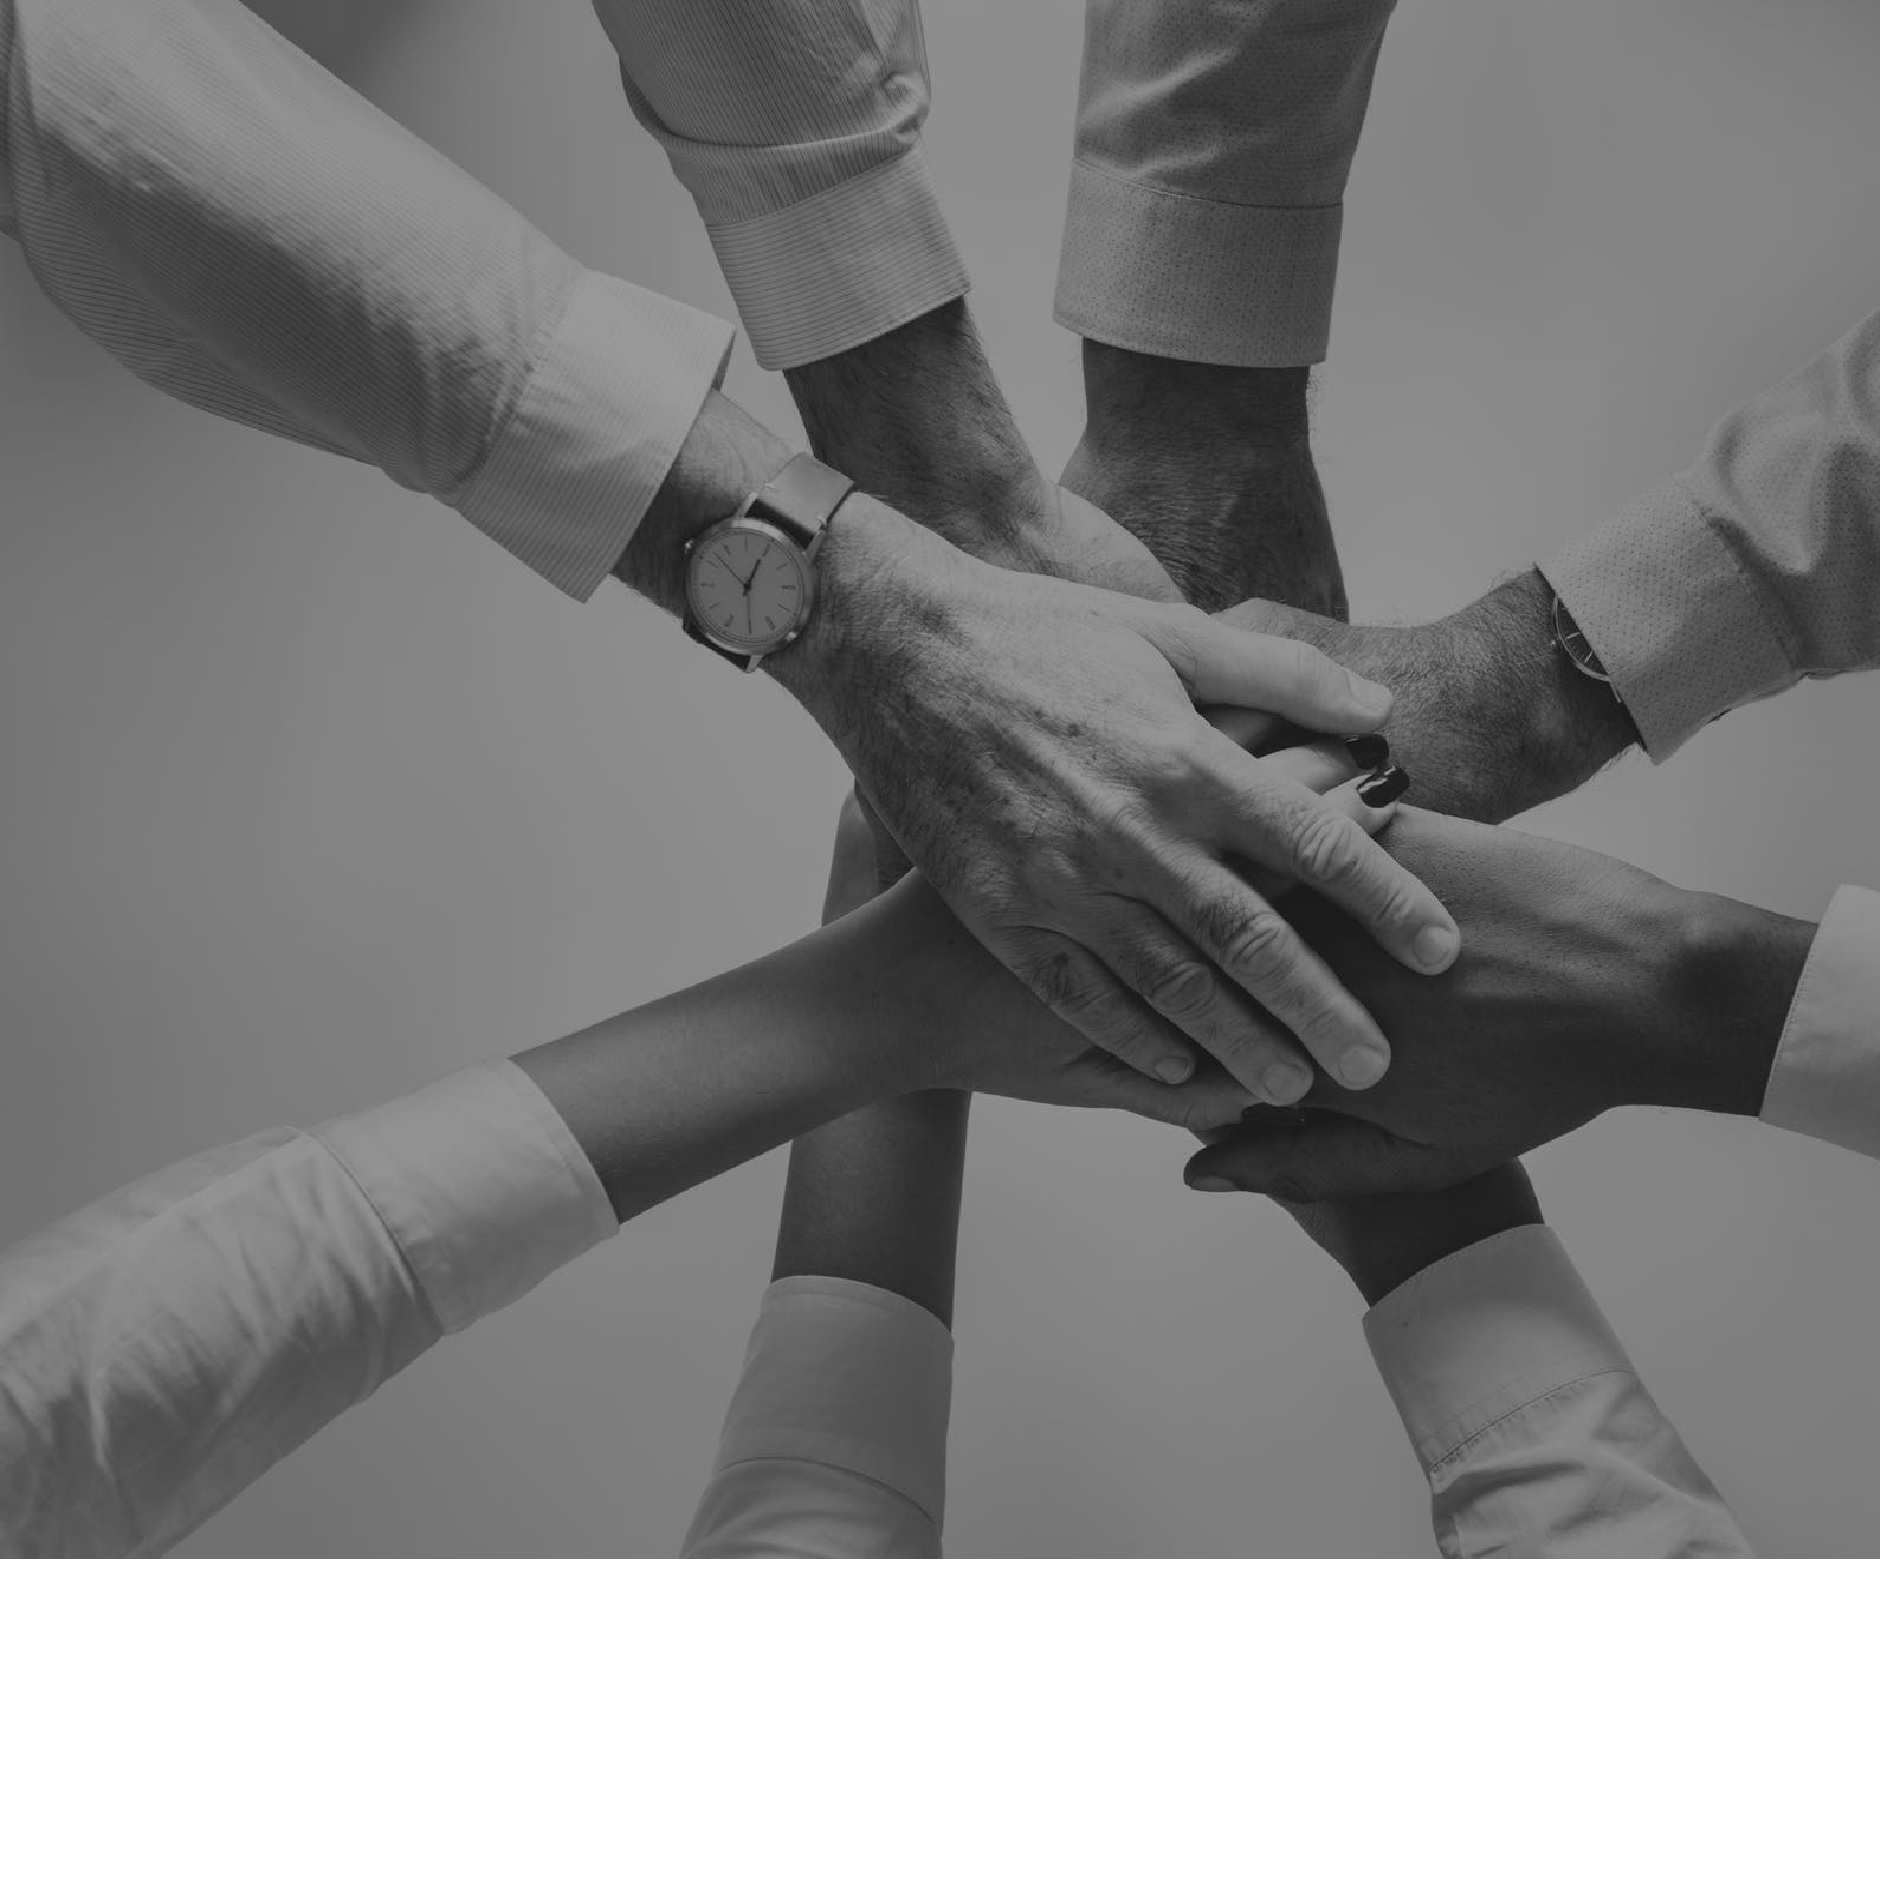 Partnership and communication - the basis of community development